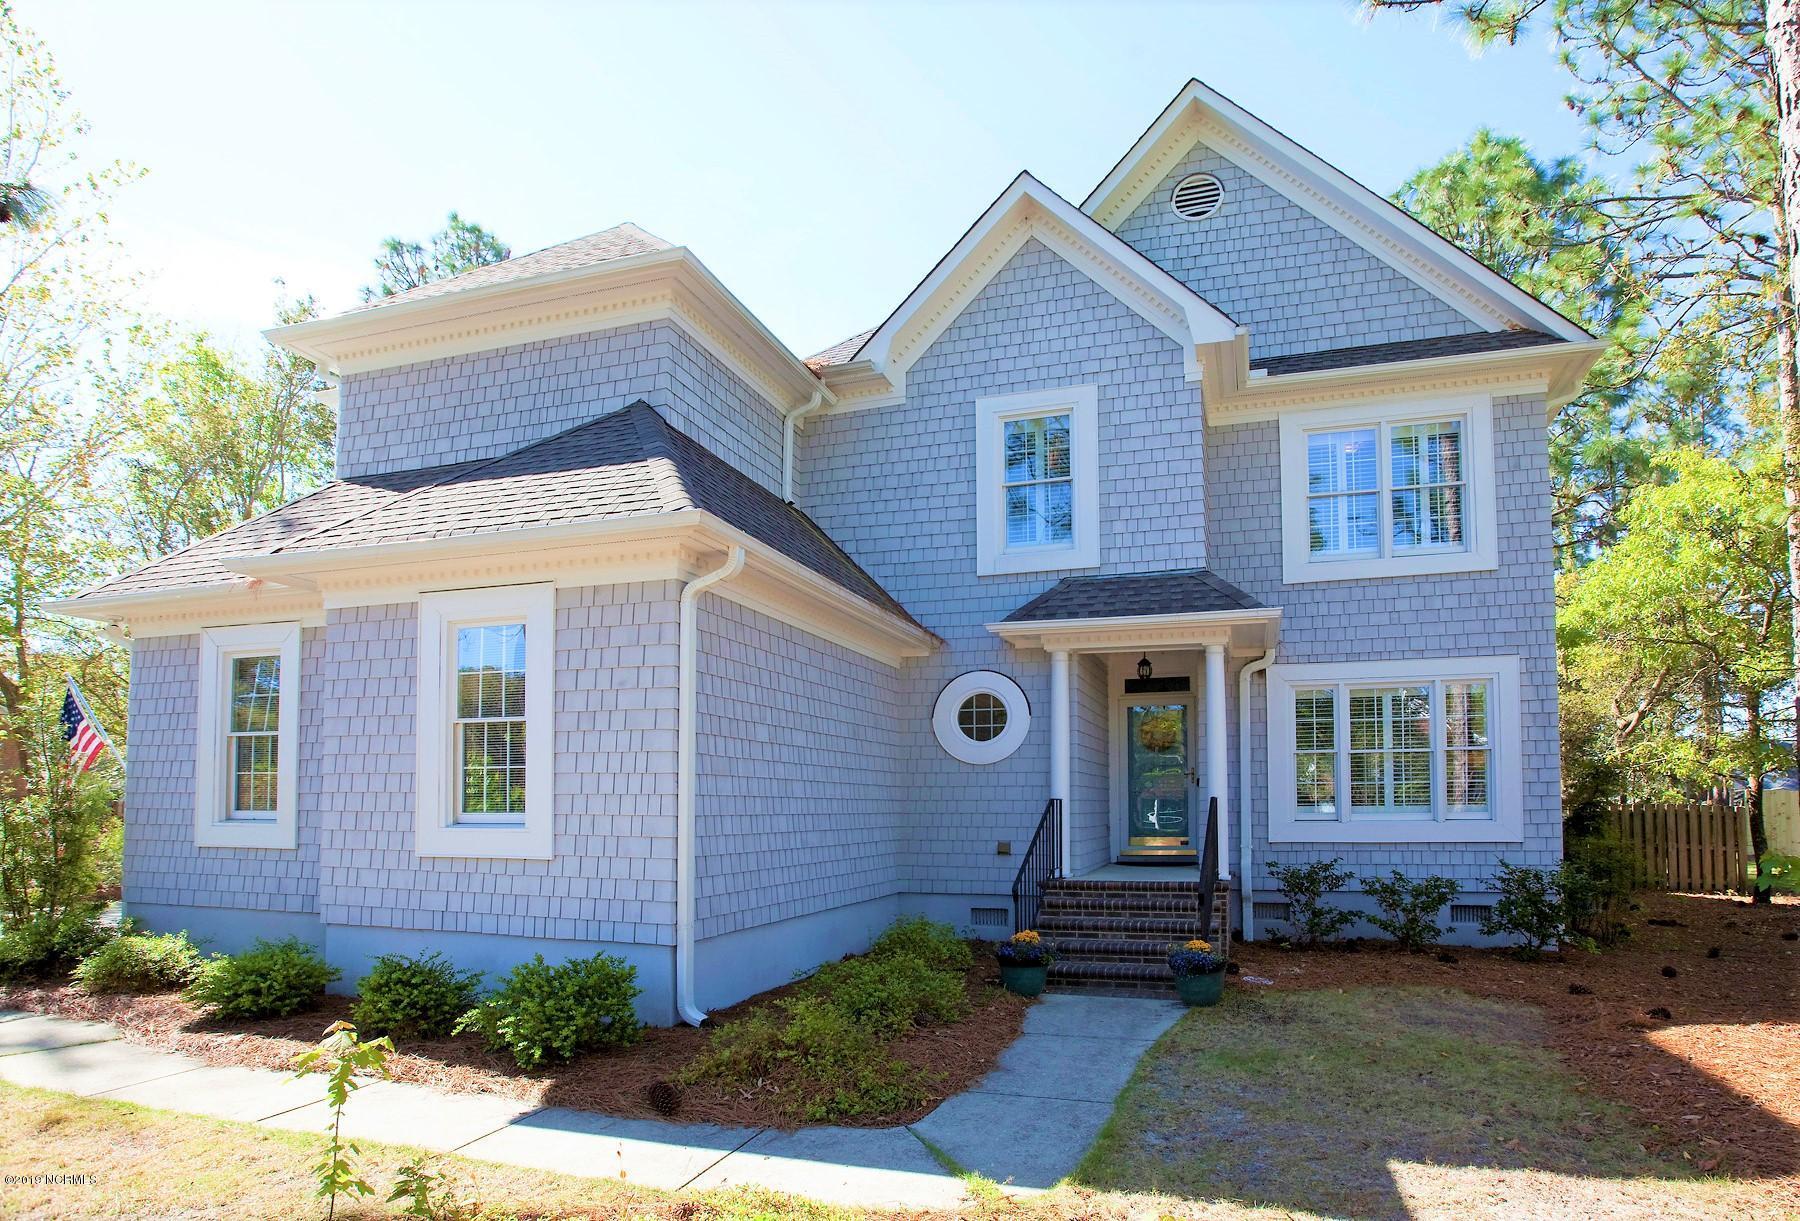 1406 Bexley Drive, Wilmington, North Carolina 28412, 4 Bedrooms Bedrooms, 8 Rooms Rooms,4 BathroomsBathrooms,Residential,For Sale,Bexley,100161279